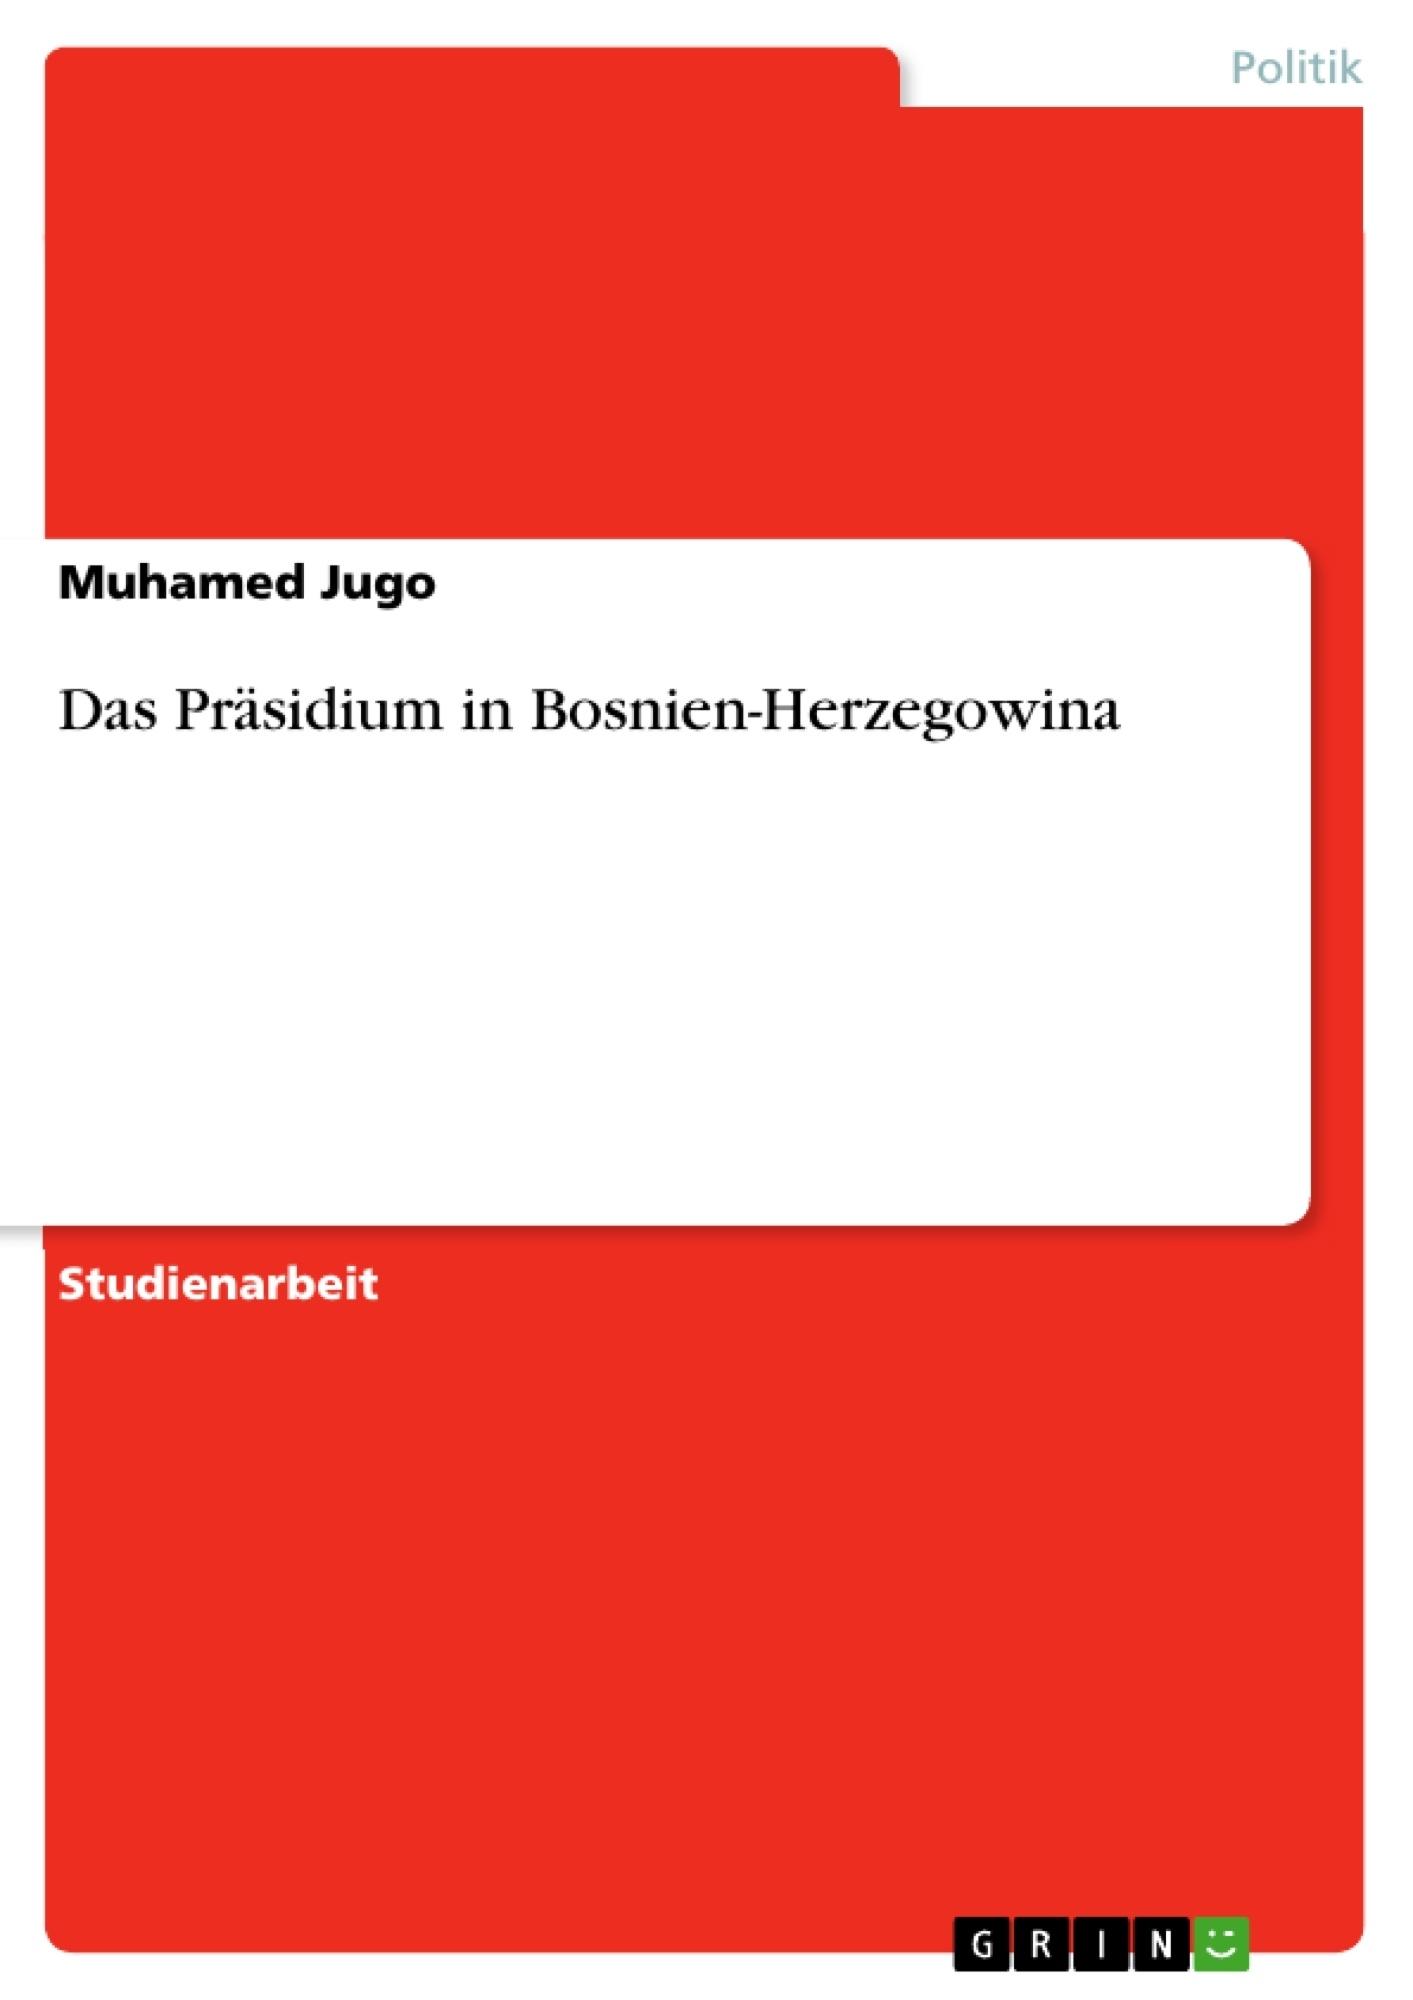 Titel: Das Präsidium in Bosnien-Herzegowina